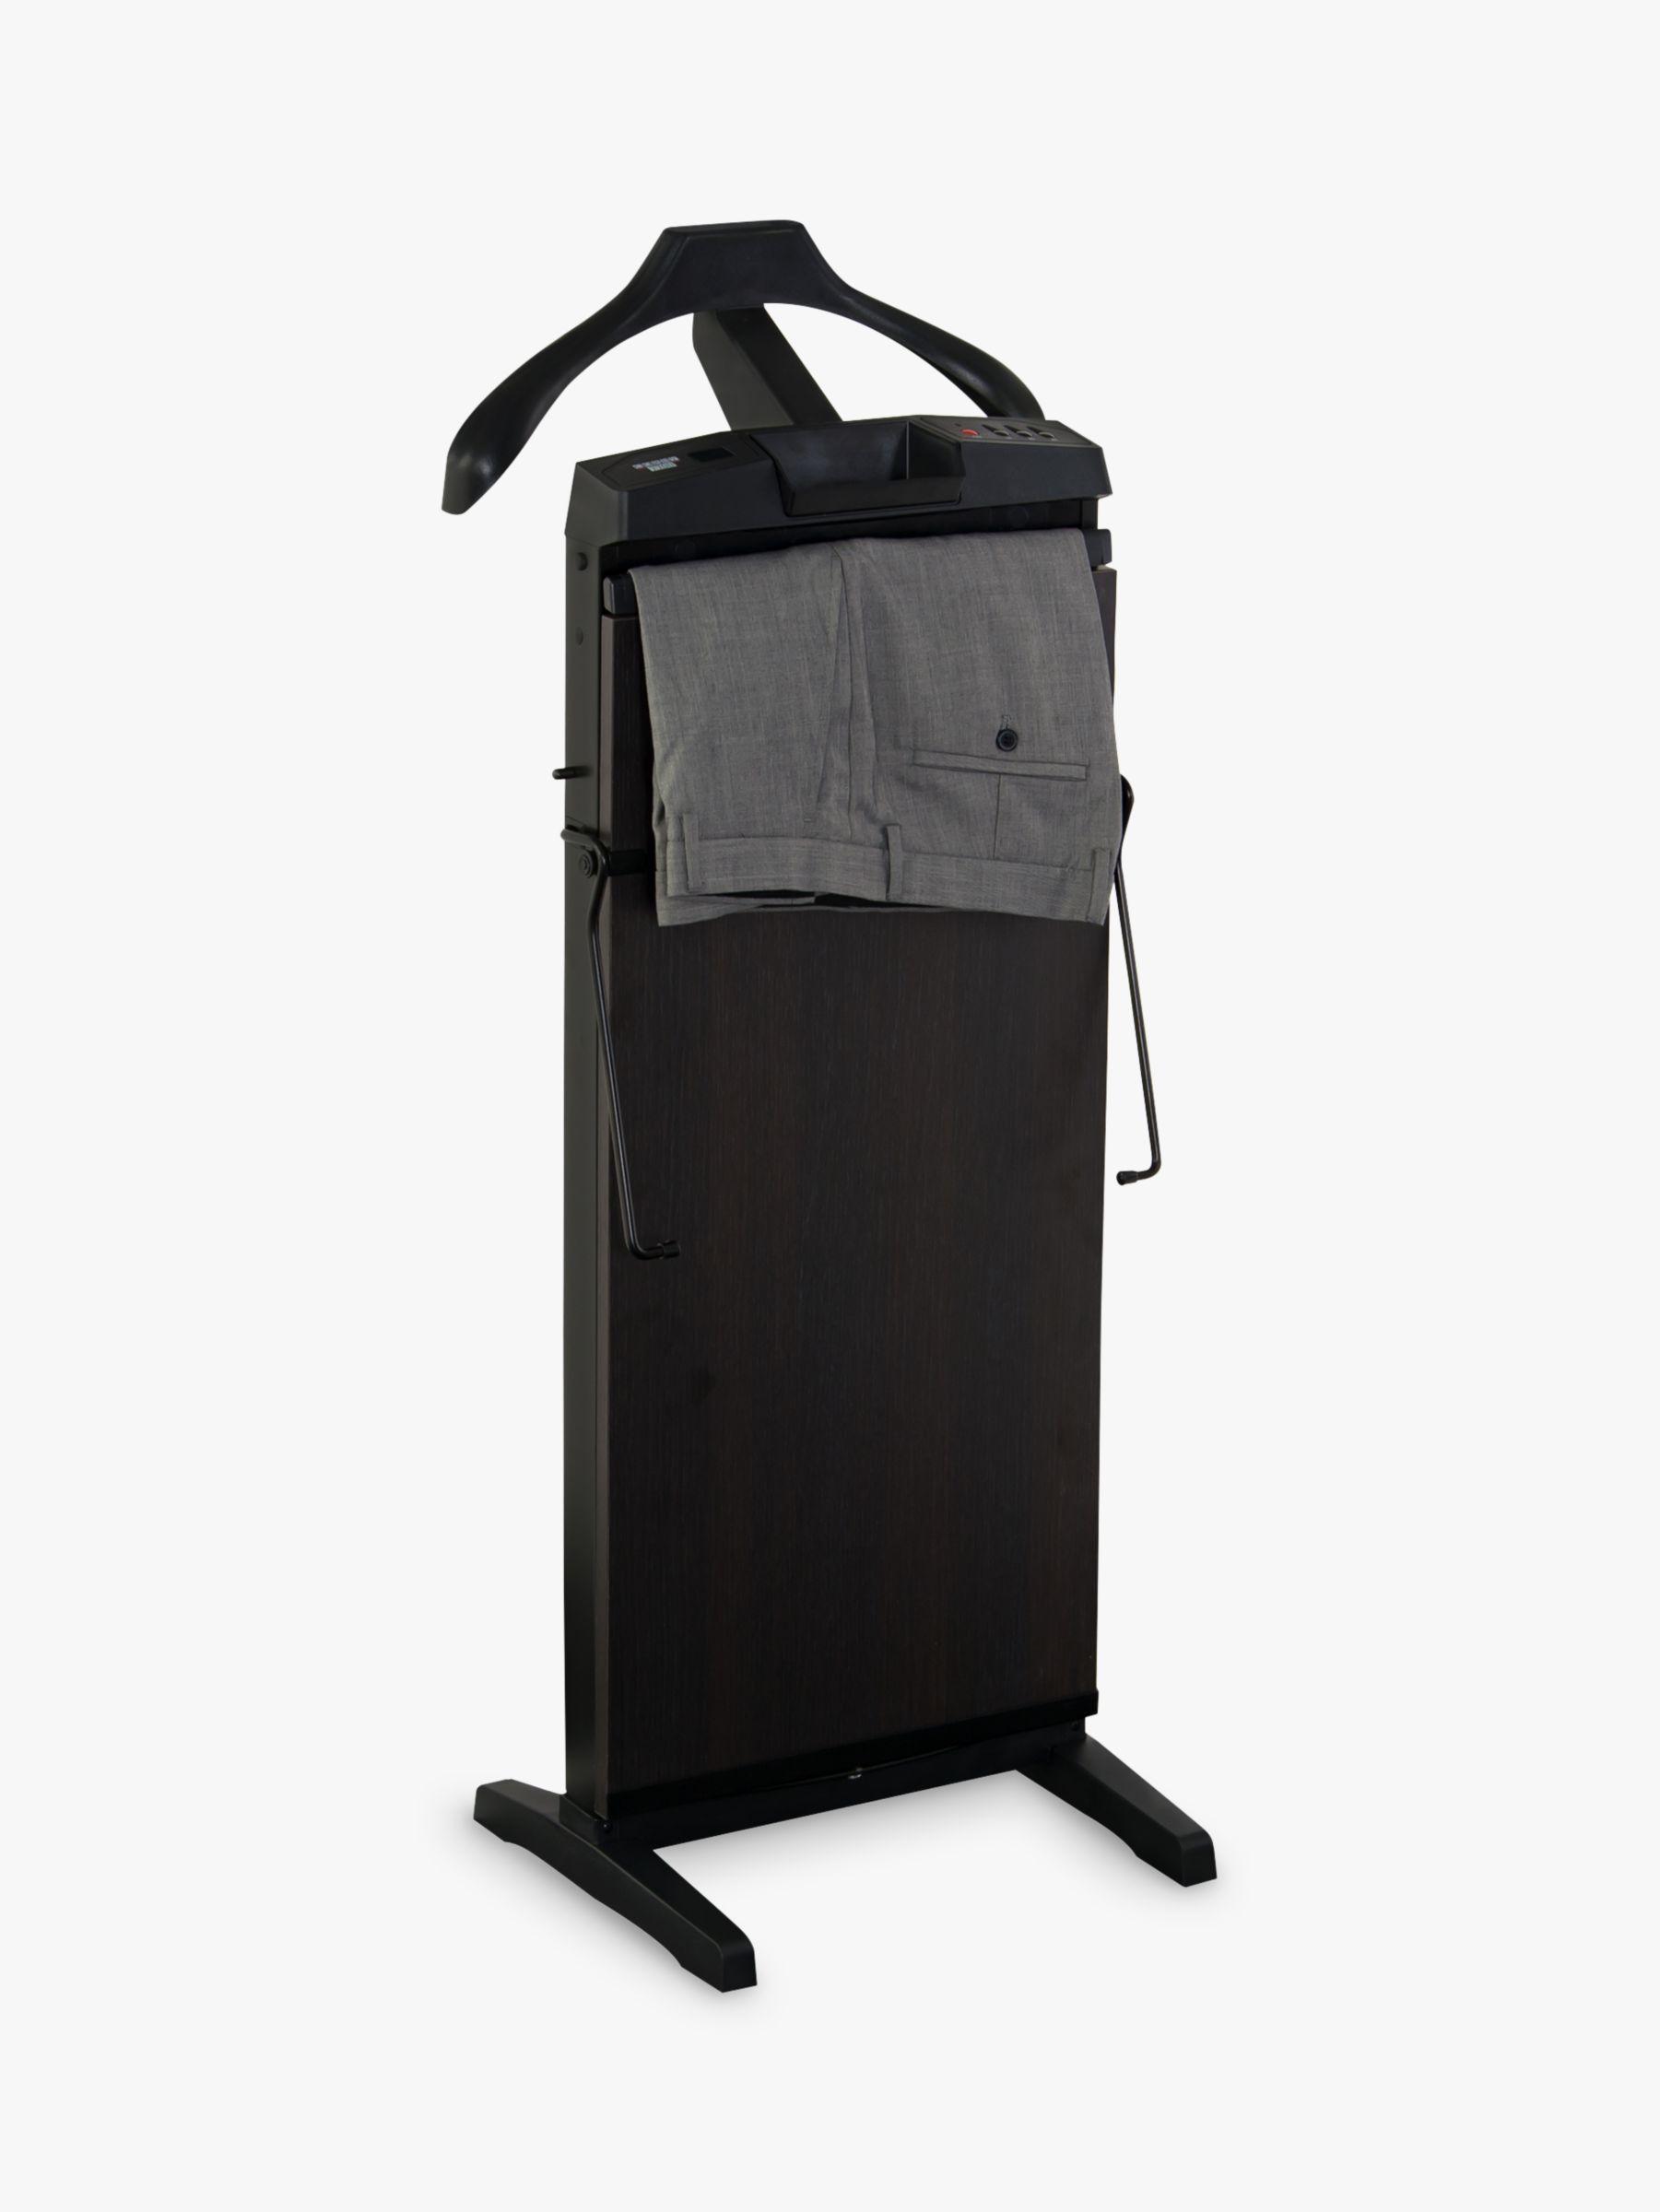 Corby 7700 Trouser Press Black Brown Sorano Oak At John Lewis Partners